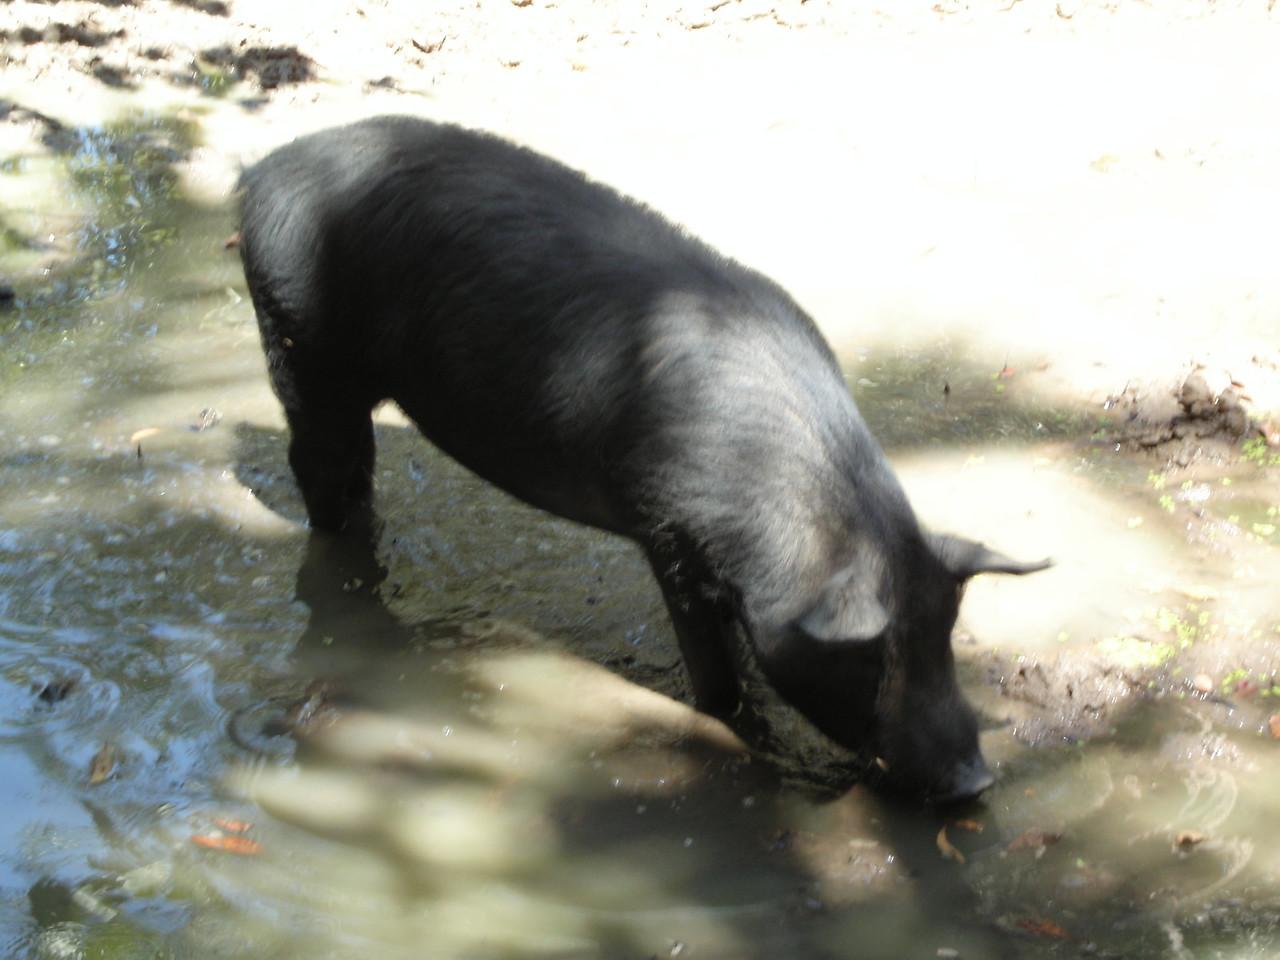 Boar at Territory Wildlife Park.